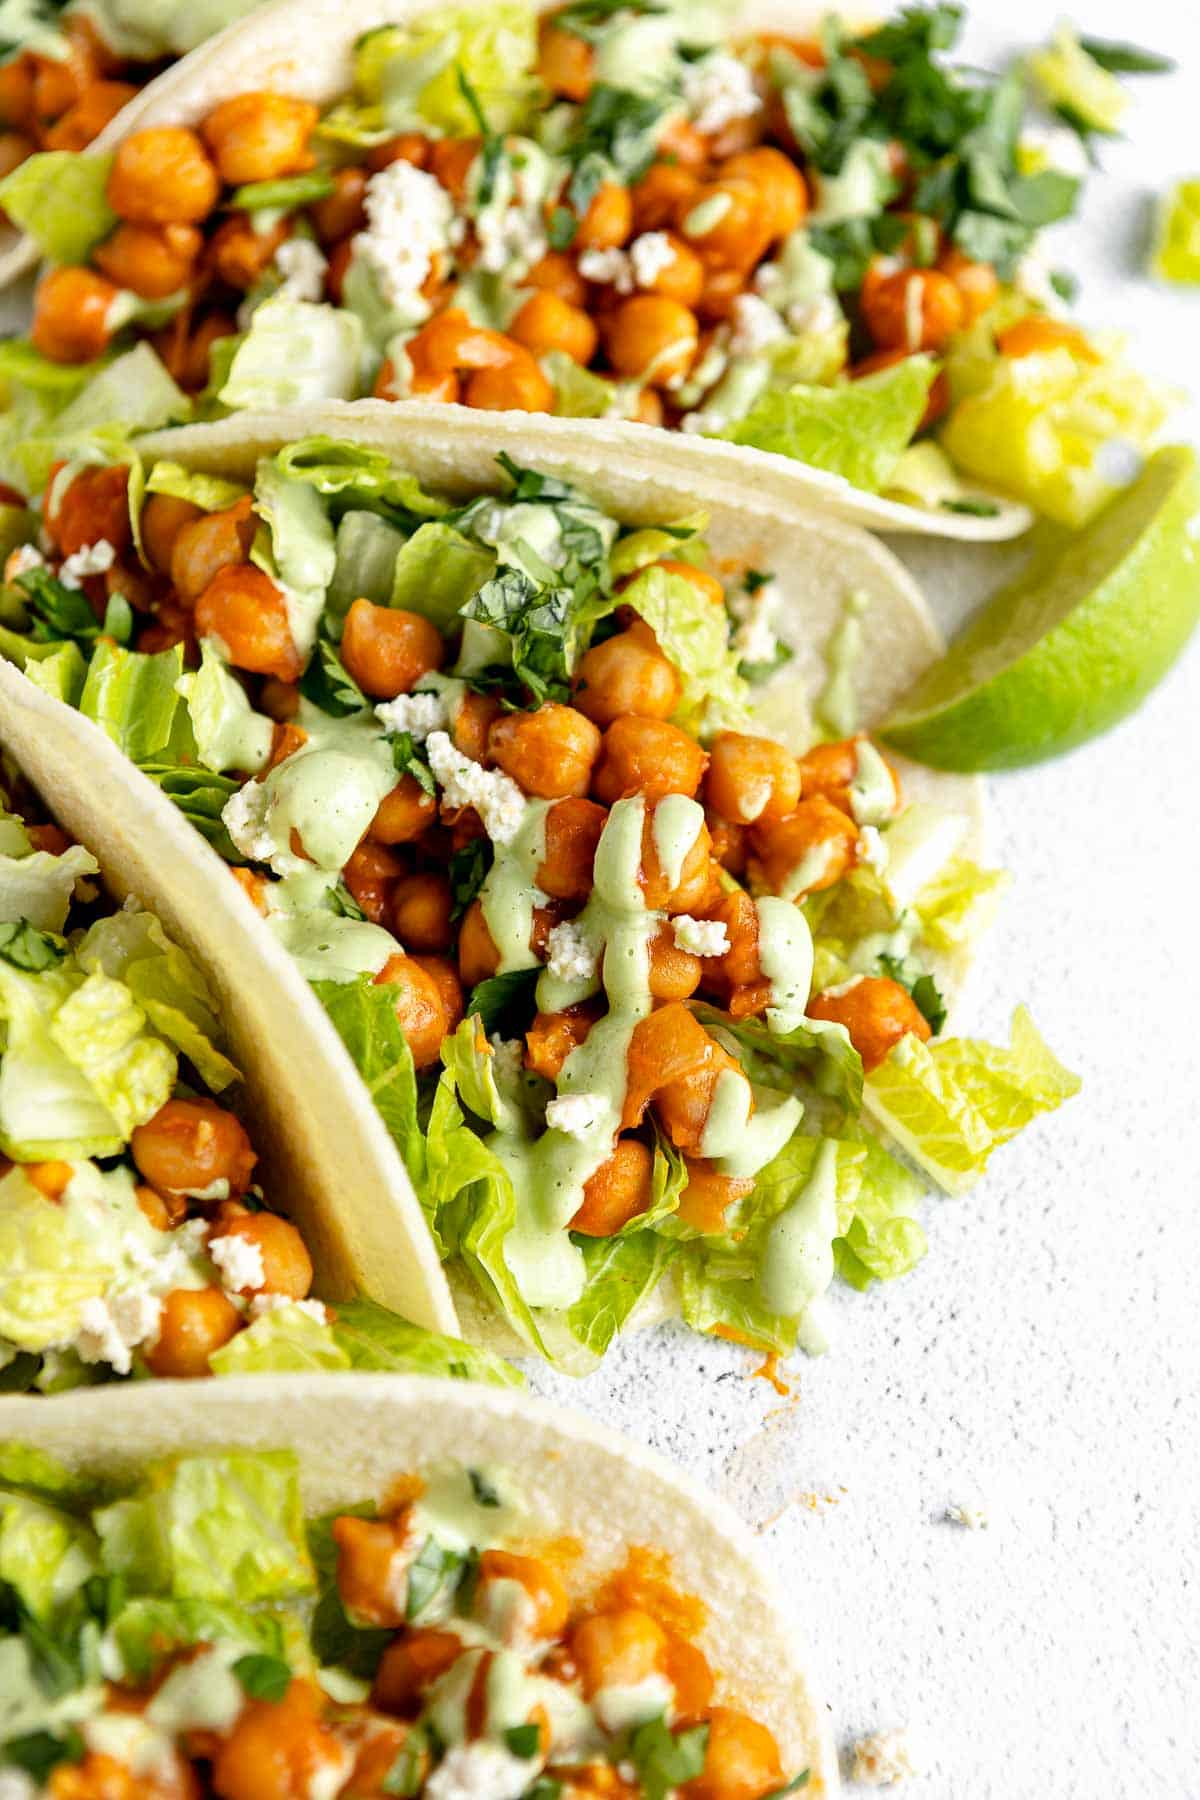 vegan chickpea tacos with corn tortillas